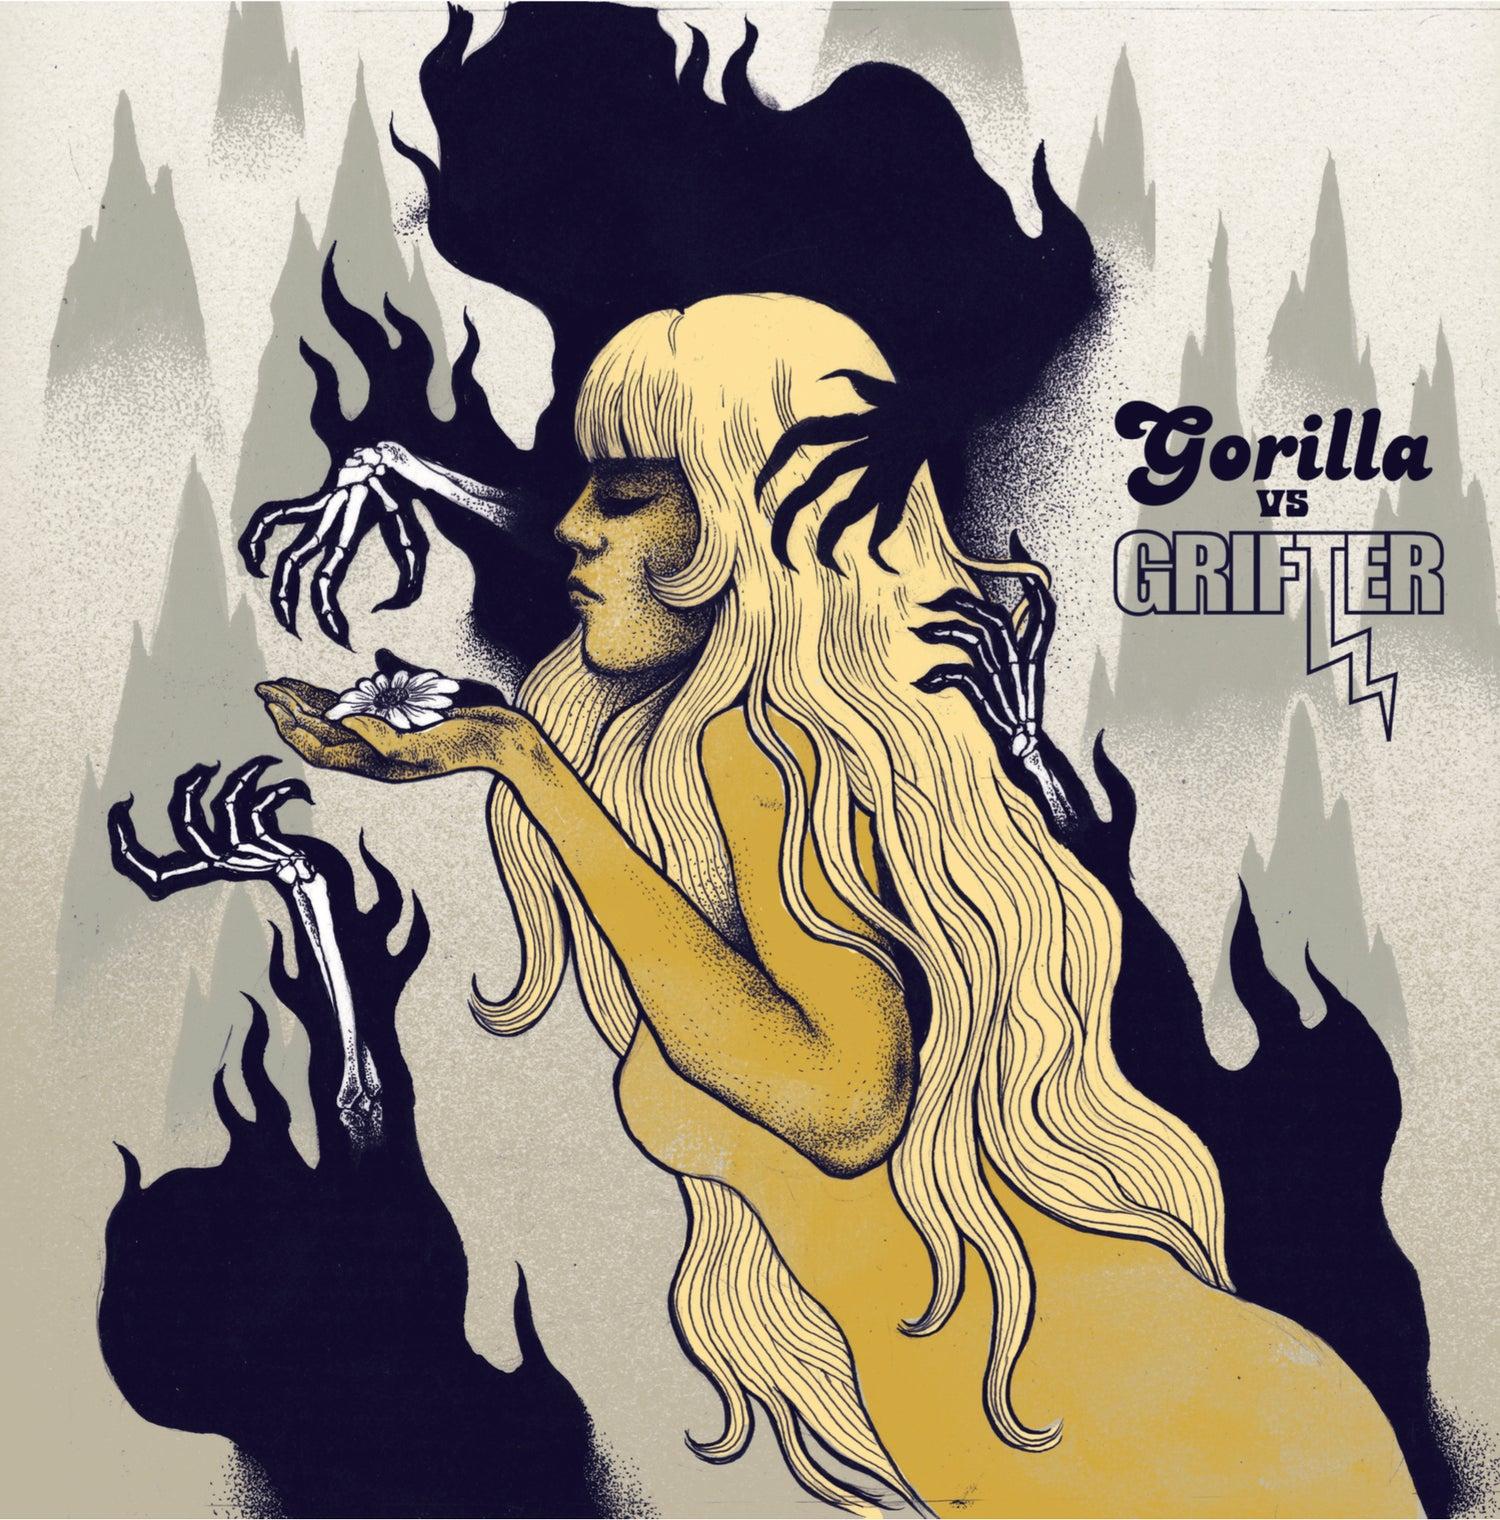 Image of Gorilla //  Grifter - Gorilla vs Grifter [LP]